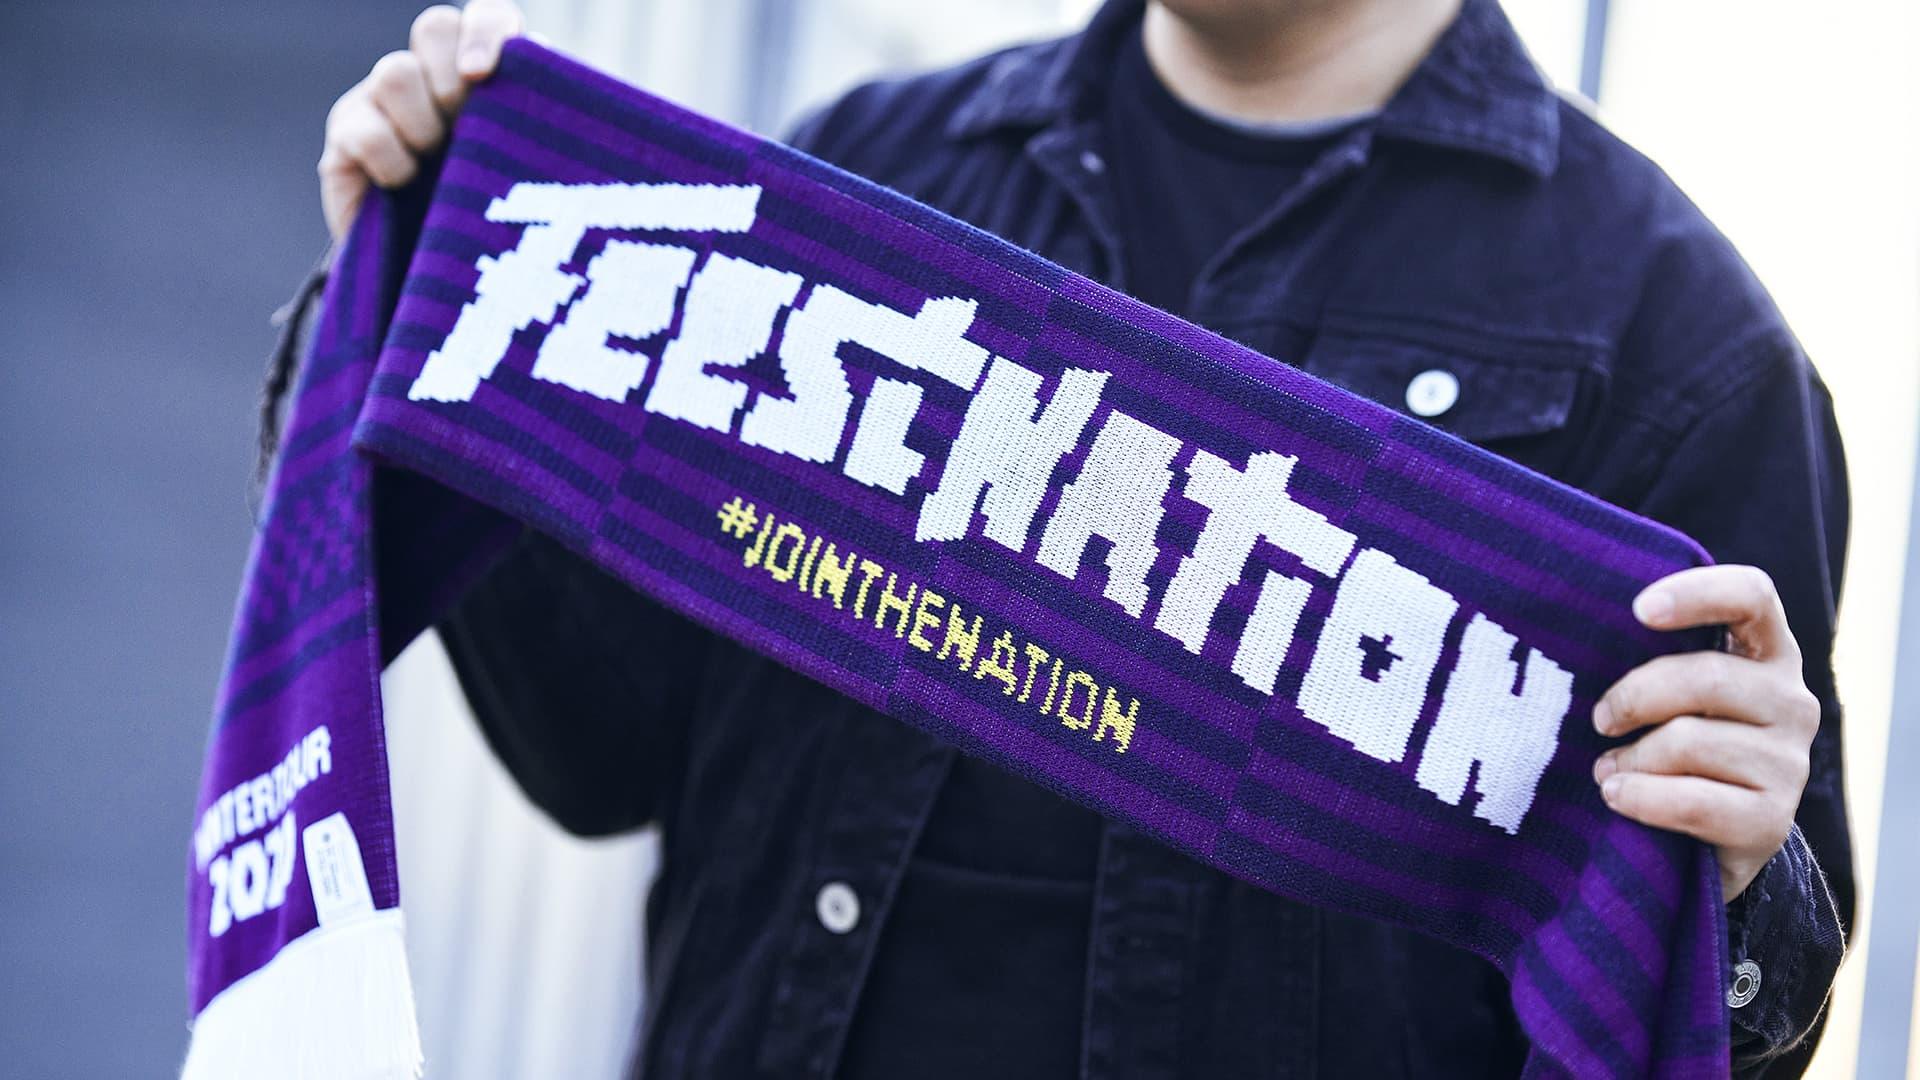 Feestnation_wintertour-2020-01